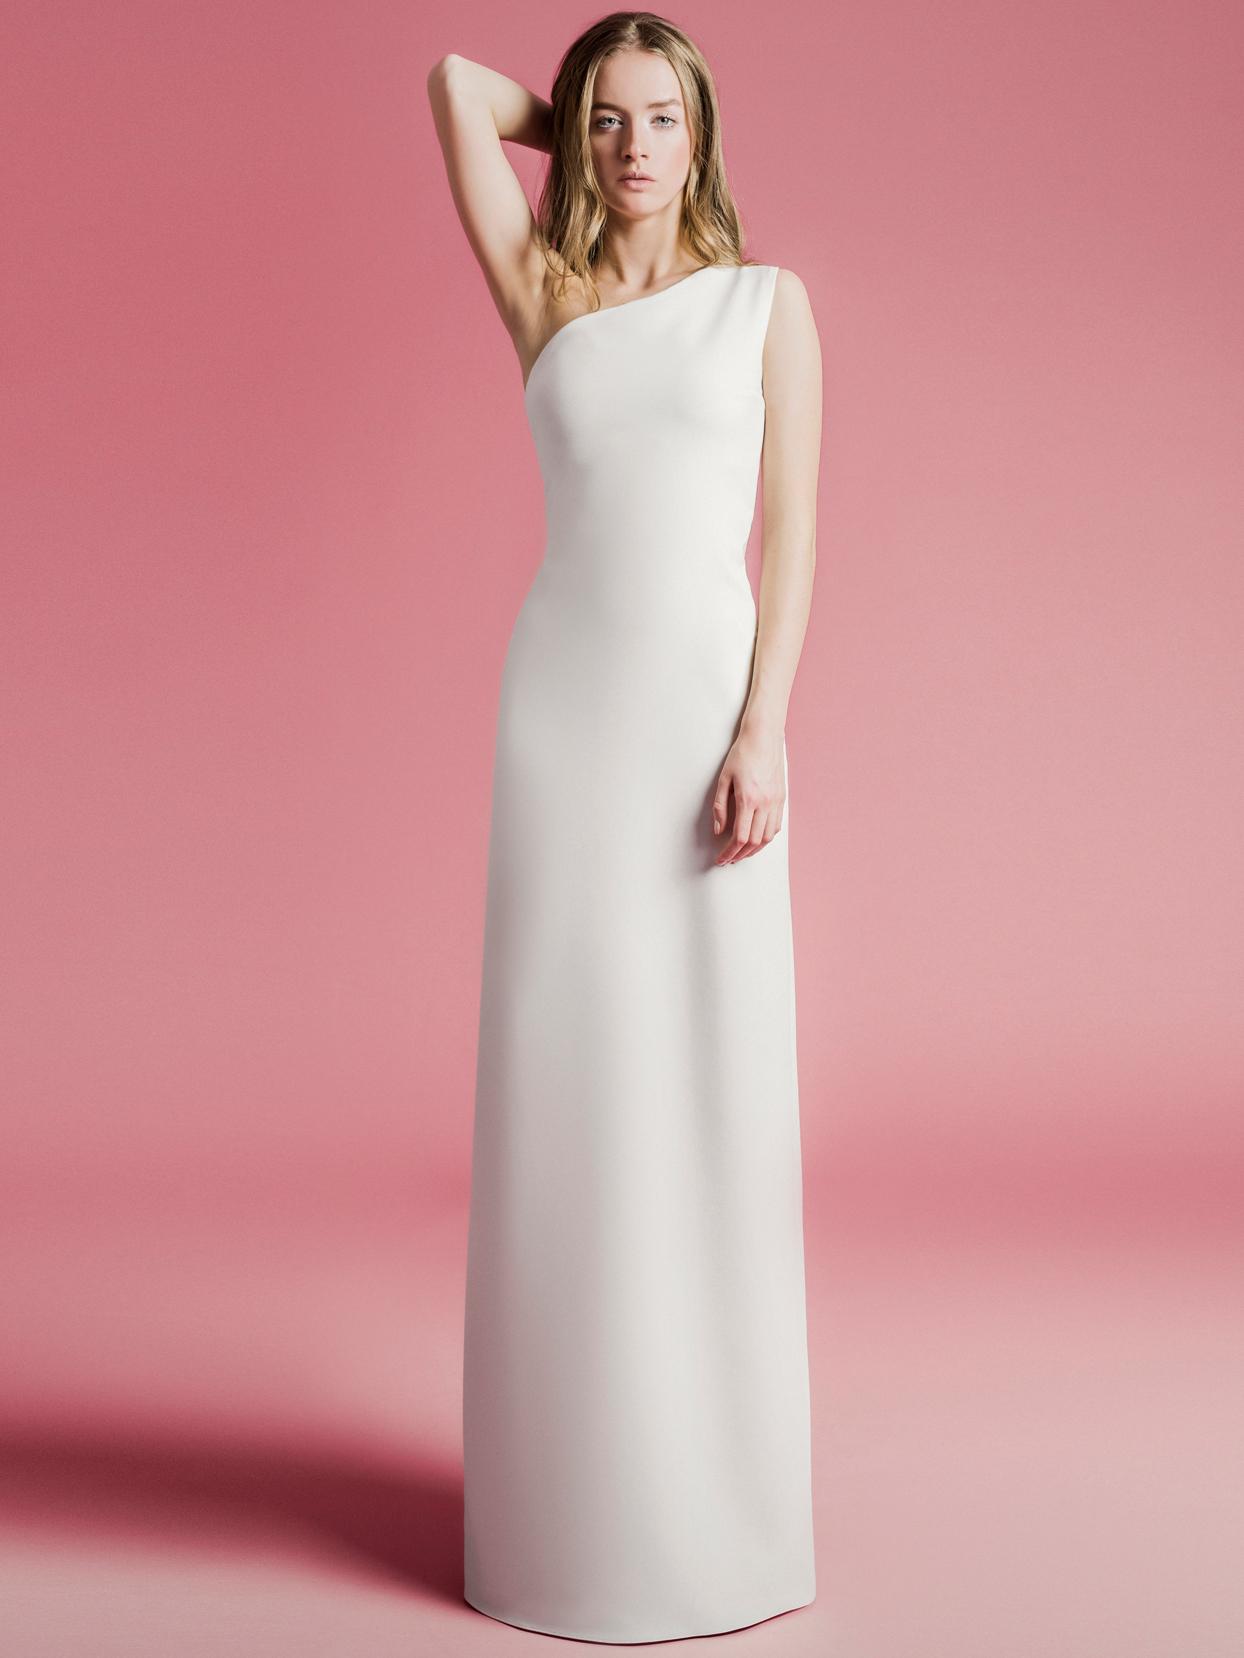 Sophie Et Voilà one shoulder sheath wedding dress spring 2021